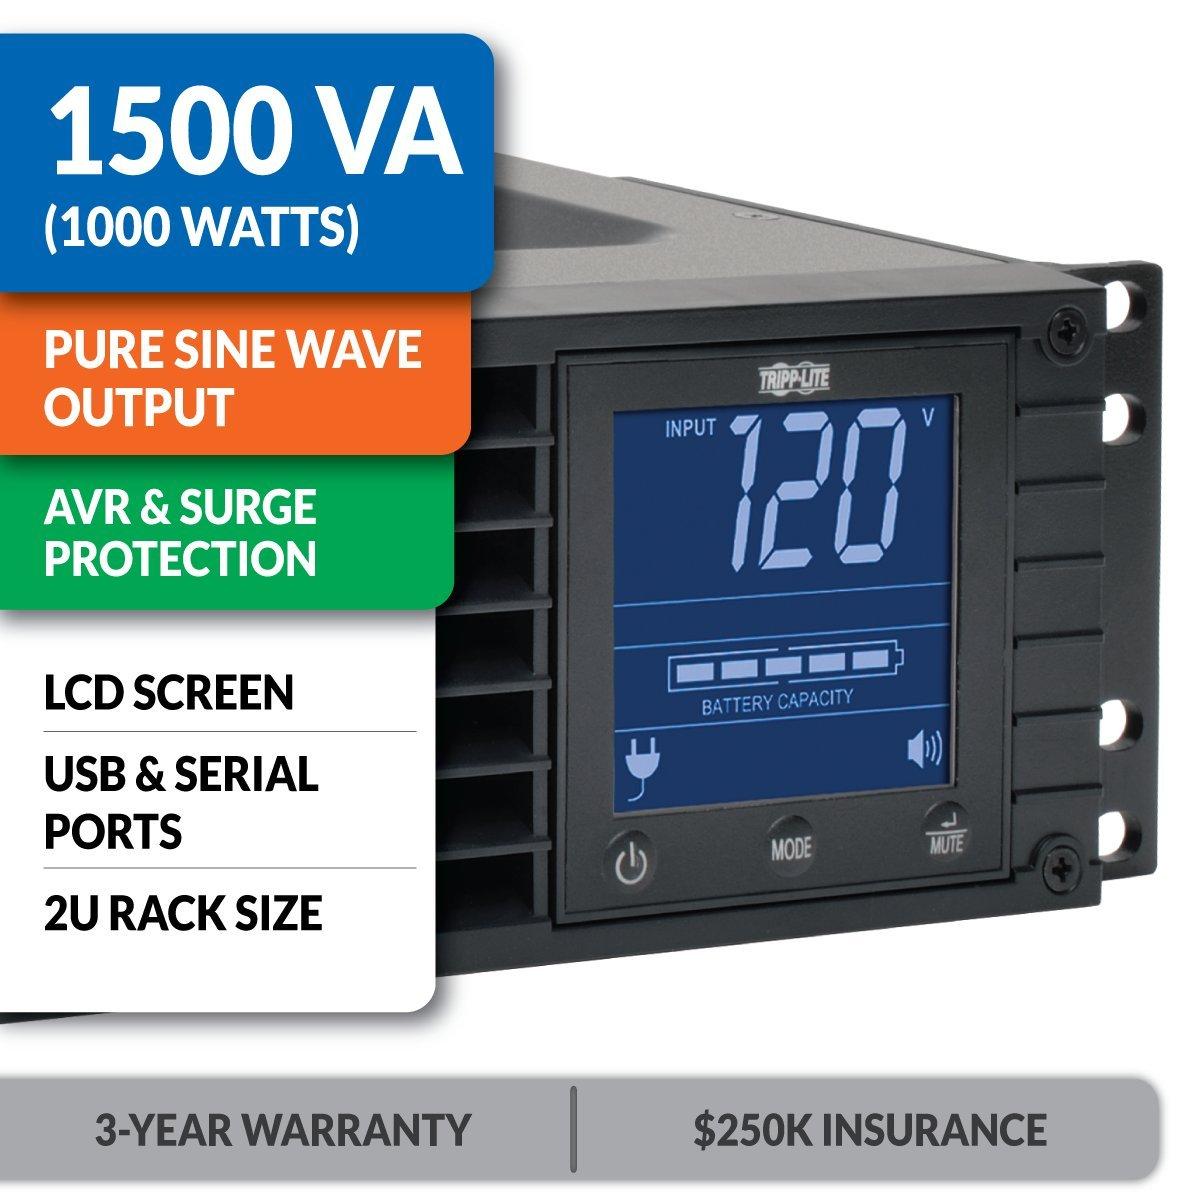 Tripp Lite 1500VA Sine Wave UPS Battery Backup, LCD, 1000W AVR Line-Interactive, 2U Rackmount, USB, DB9 (SMC15002URM)